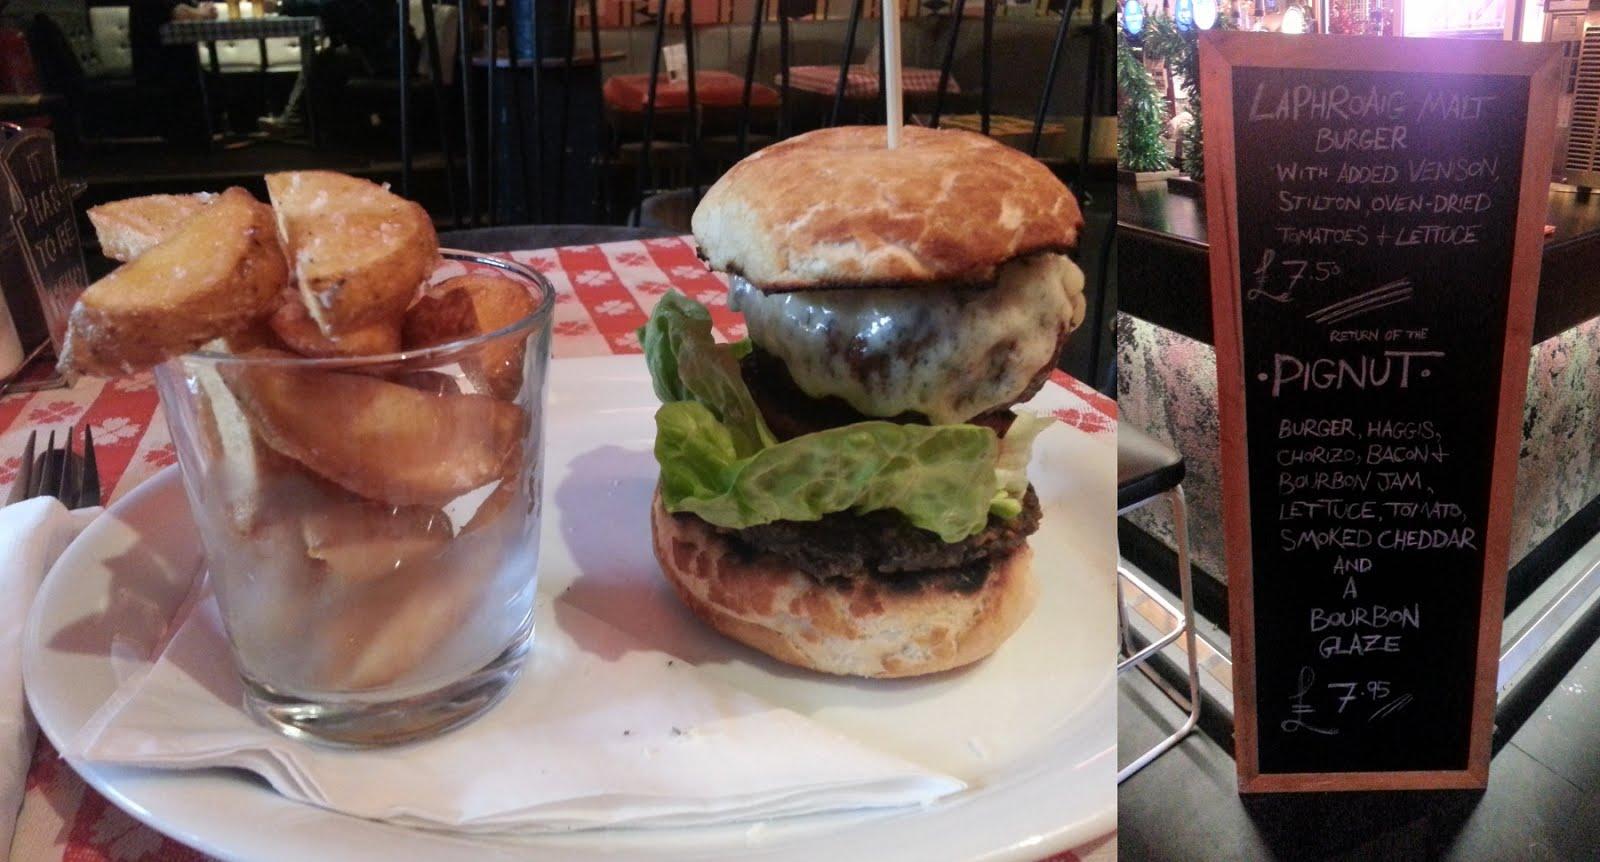 Nice 'n Sleazy, Glasgow, PIgnut burger